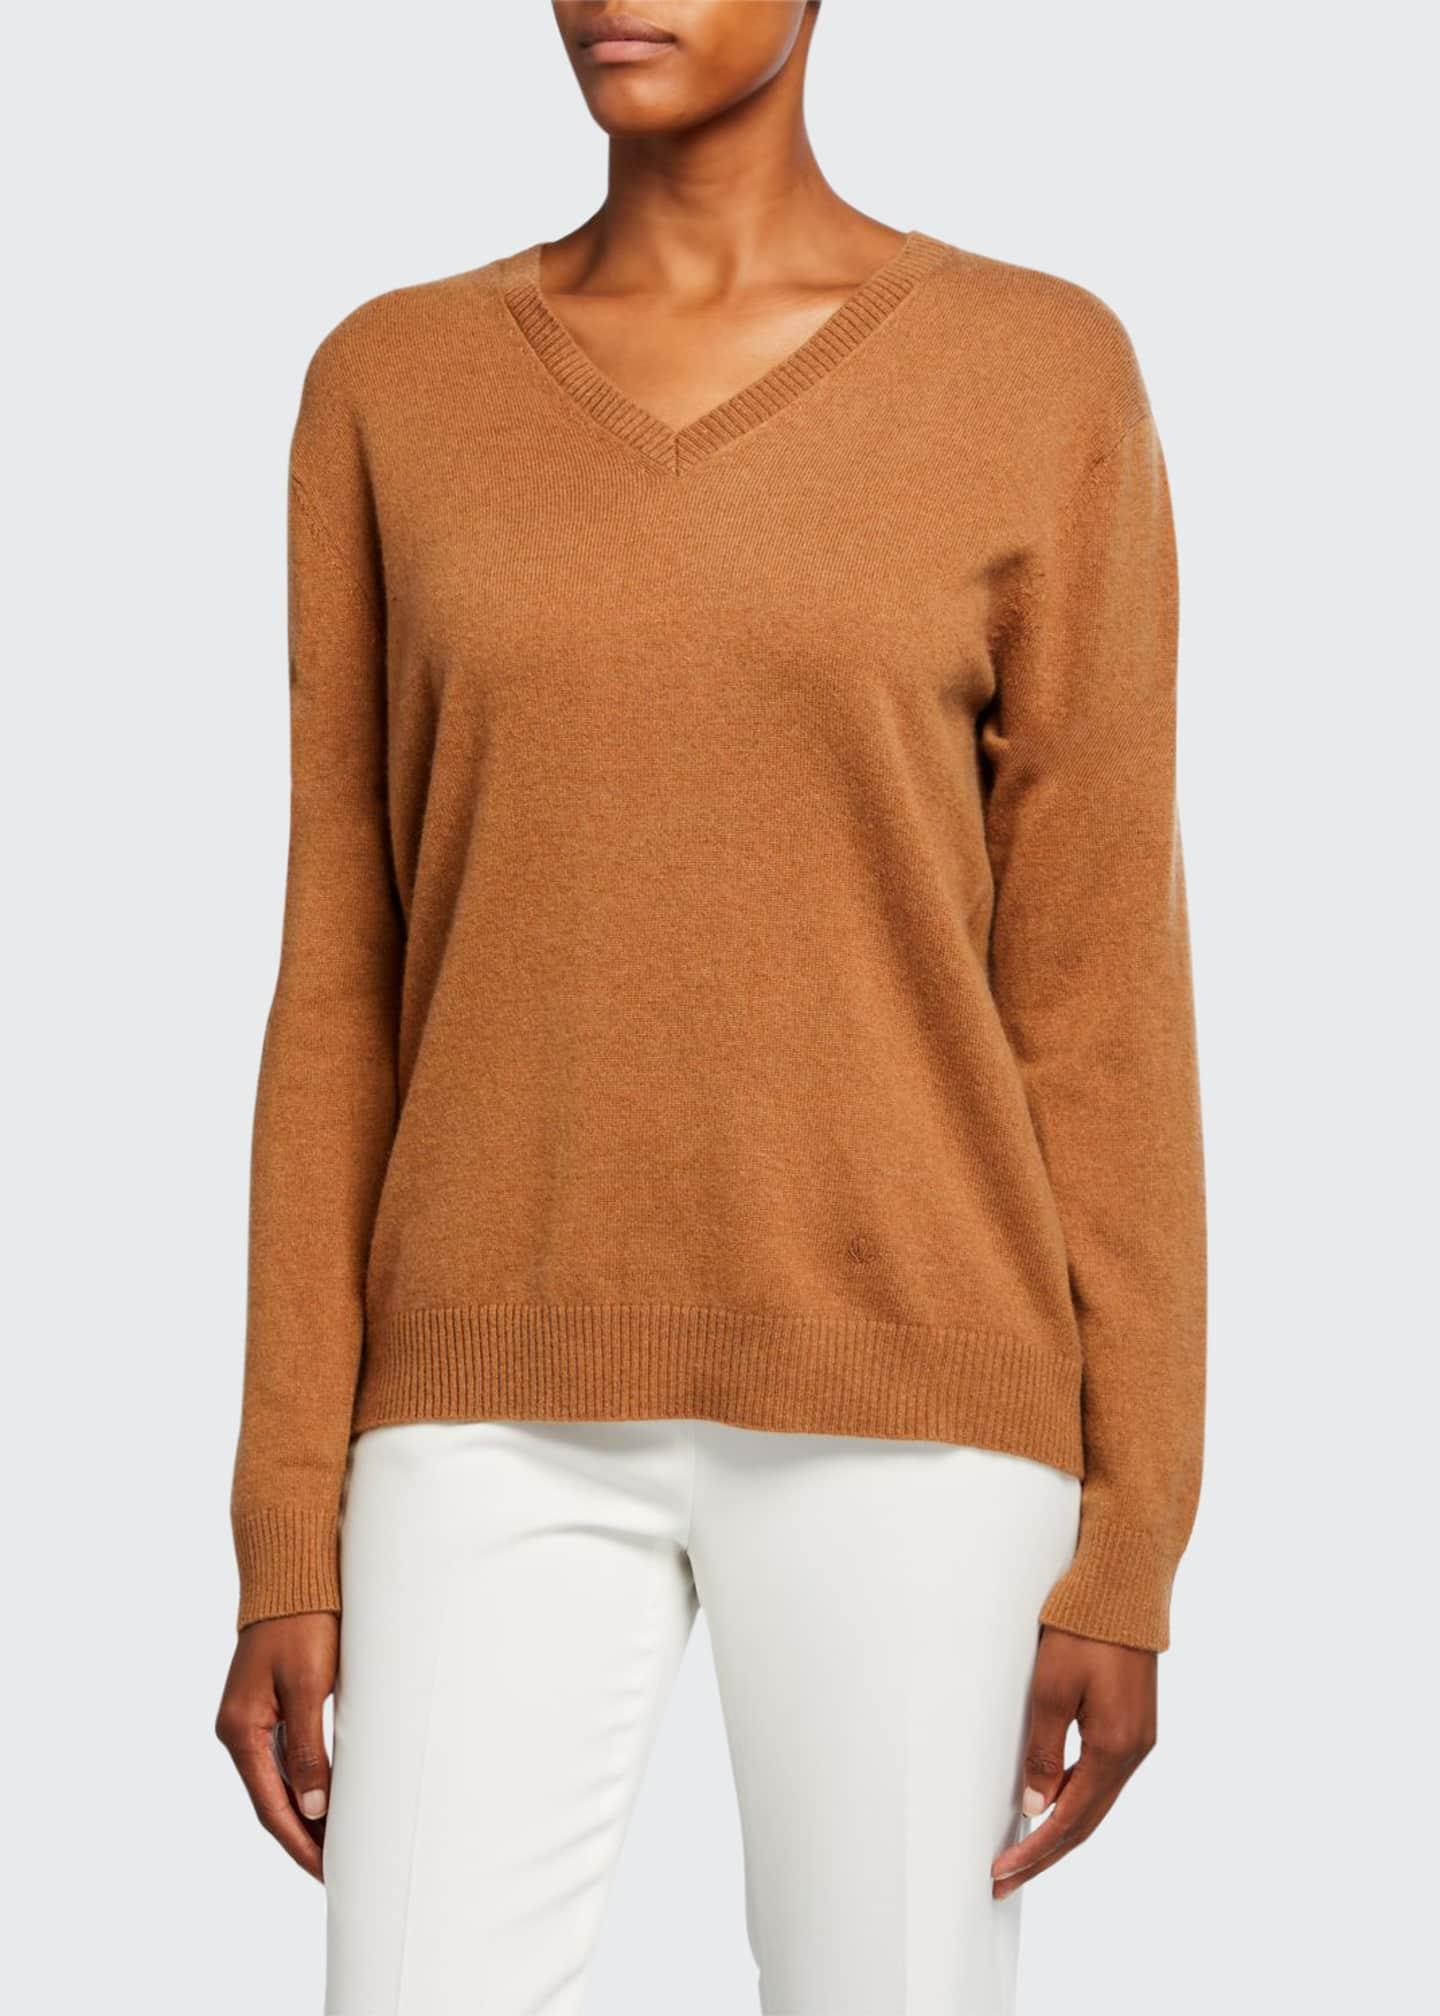 Loulou Studio V-Neck Classic Cashmere Sweater